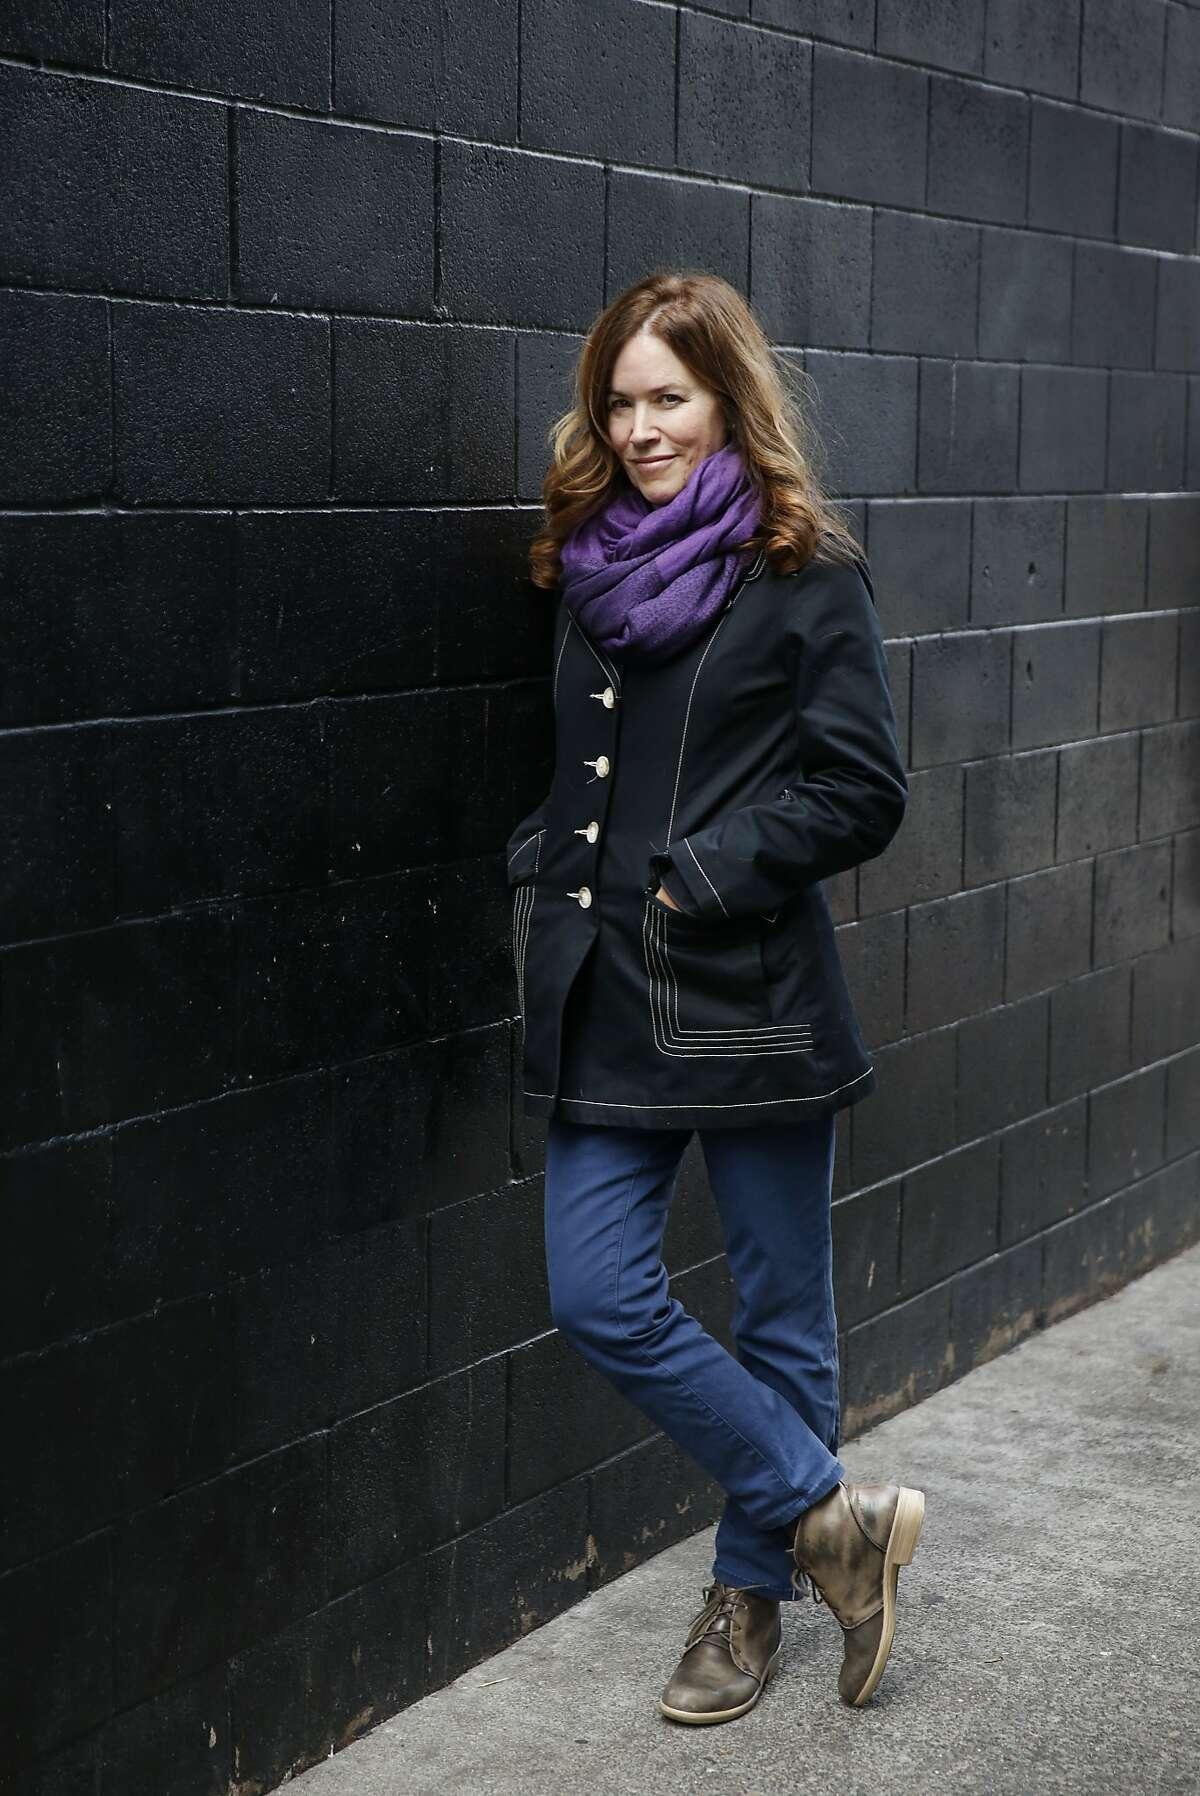 Elizabeth McKenzie, author of The Portable Veblen, pictured Jan. 30, 2016 in Palo Alto, Calif.